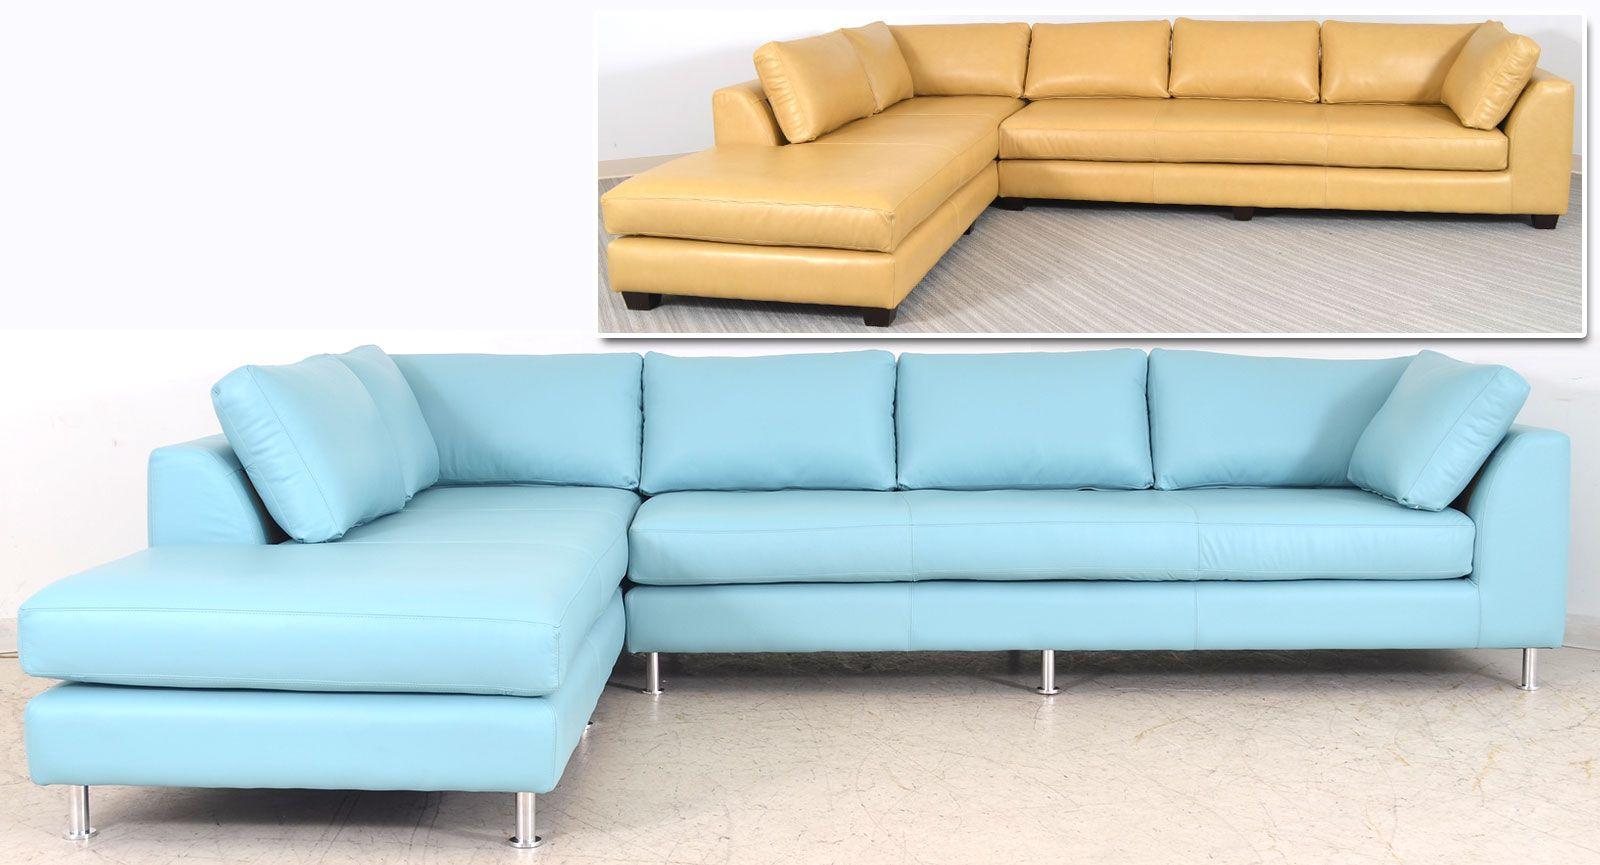 Tan Leather Or Sky Blue Leather Alexandria Sofa The Leather